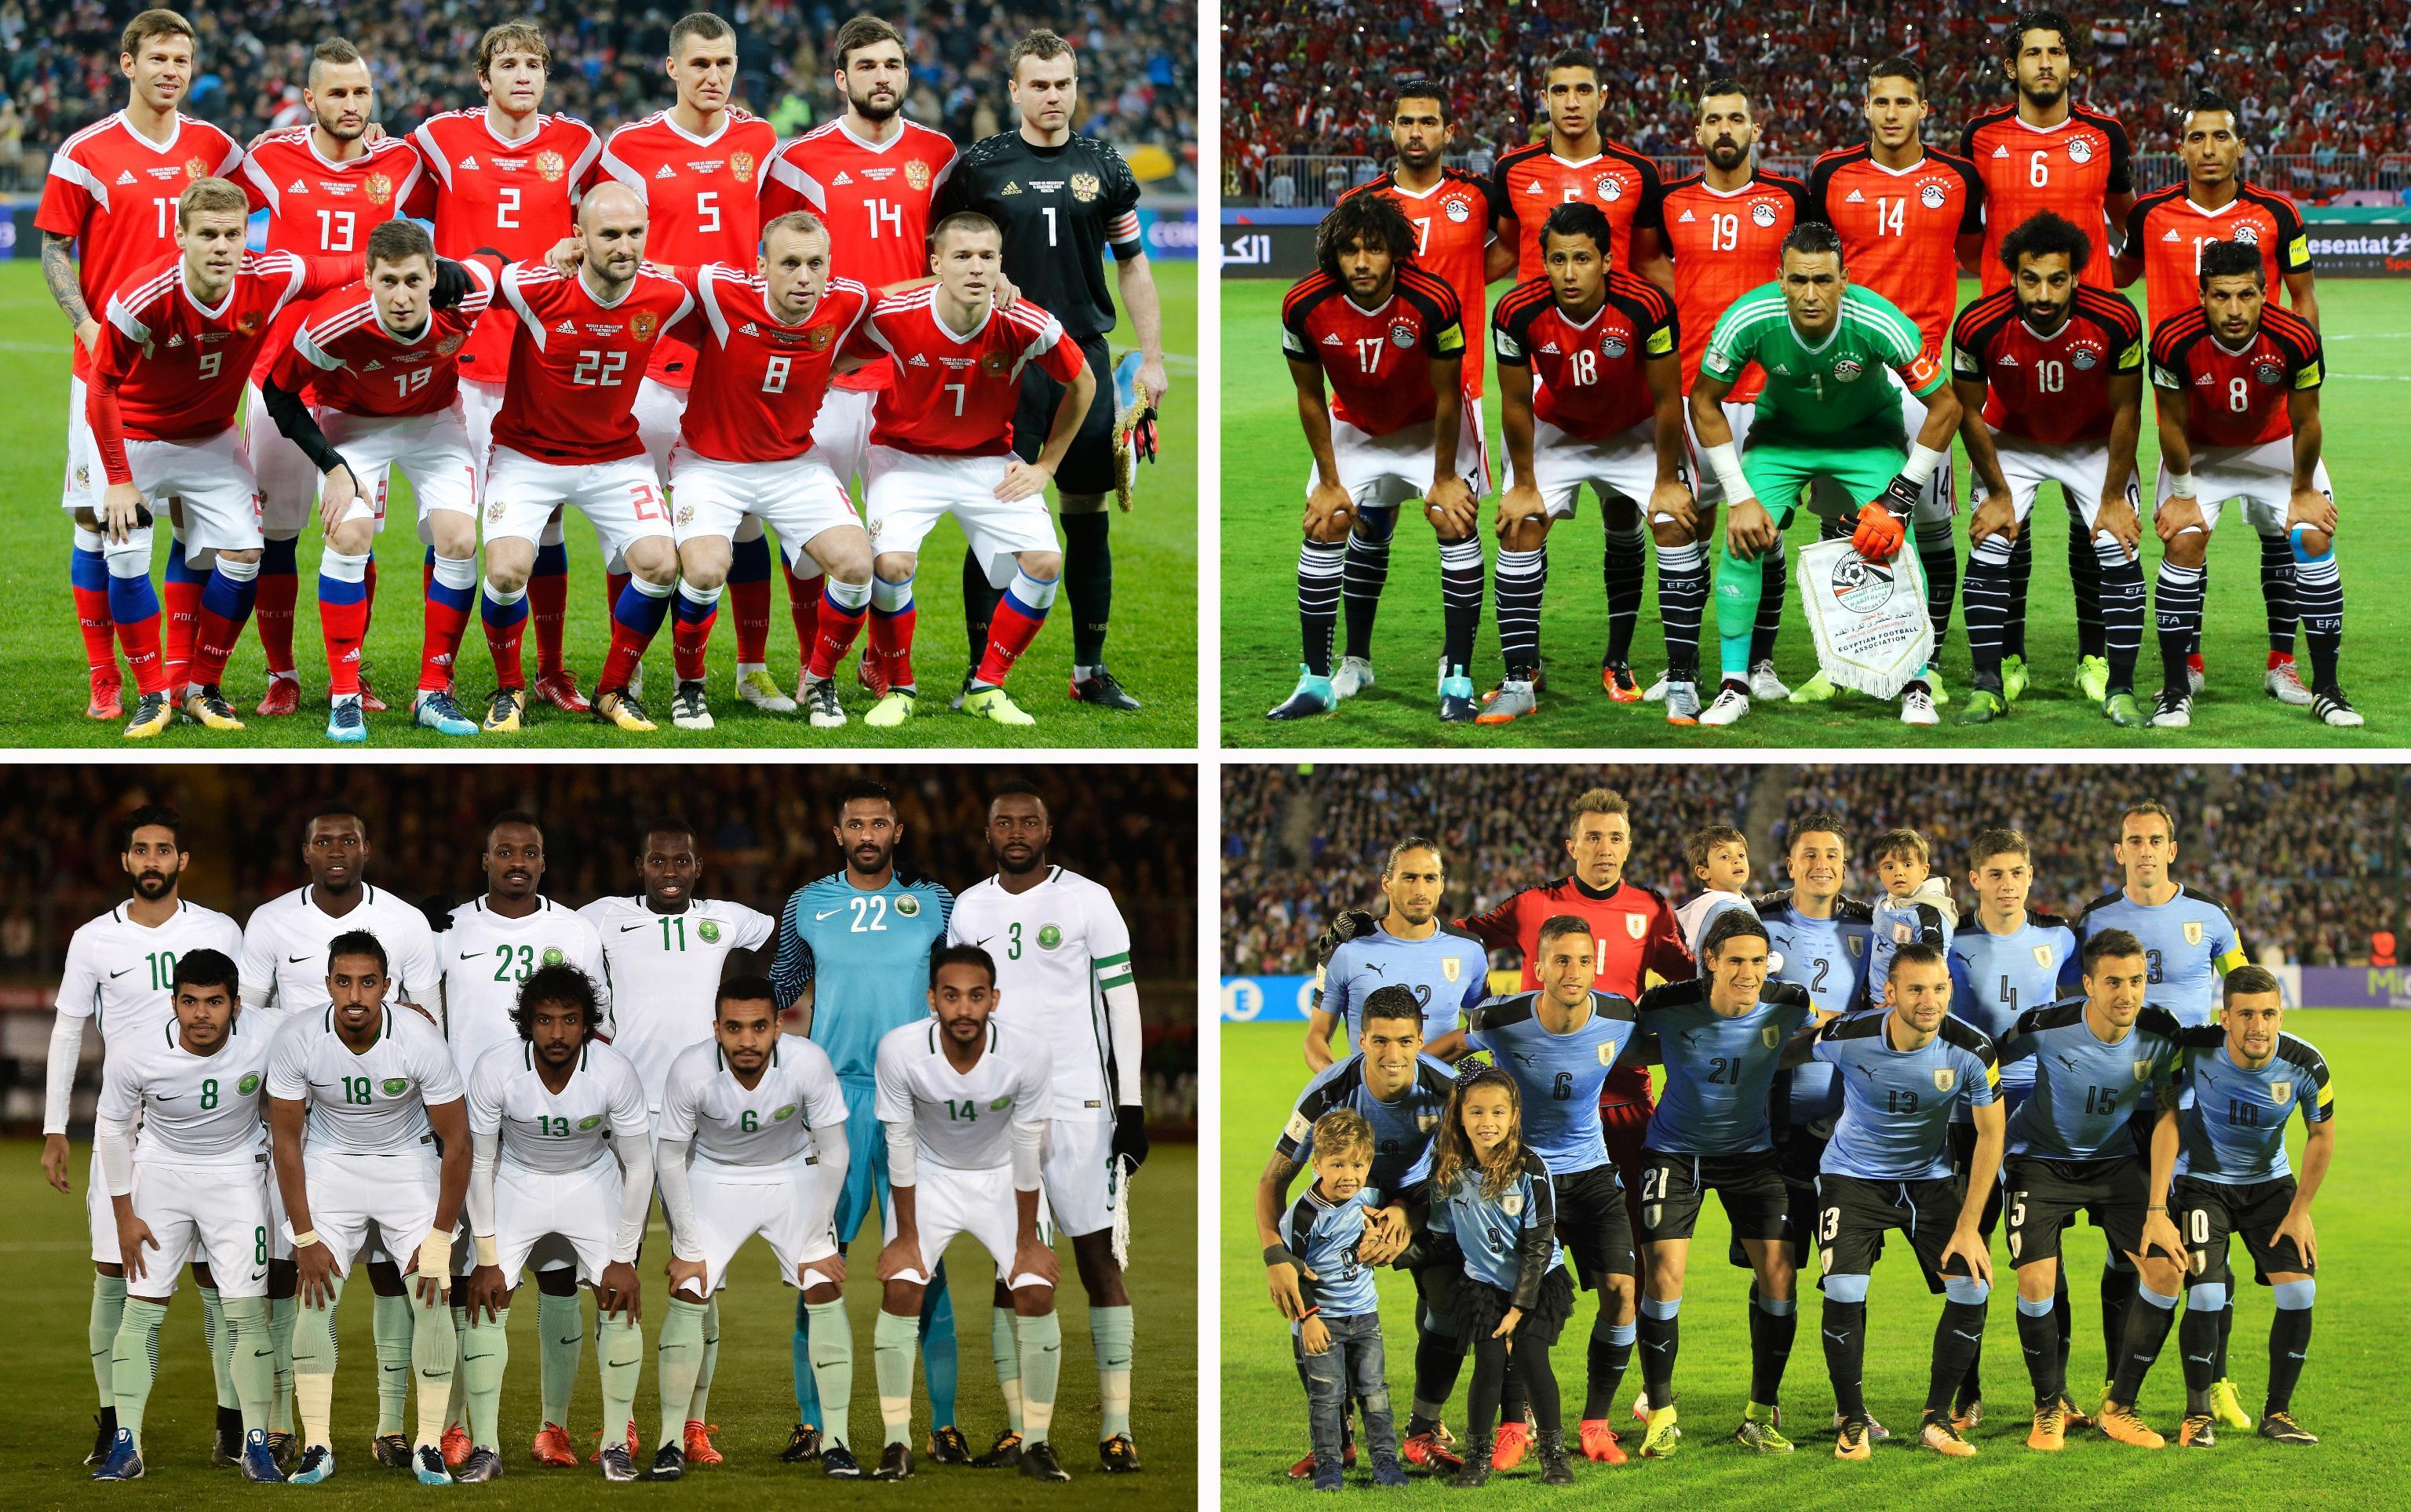 Gruppo G Mondiali 2020 Calendario.Mondiali 2018 Gli 8 Gironi Virgilio Sport